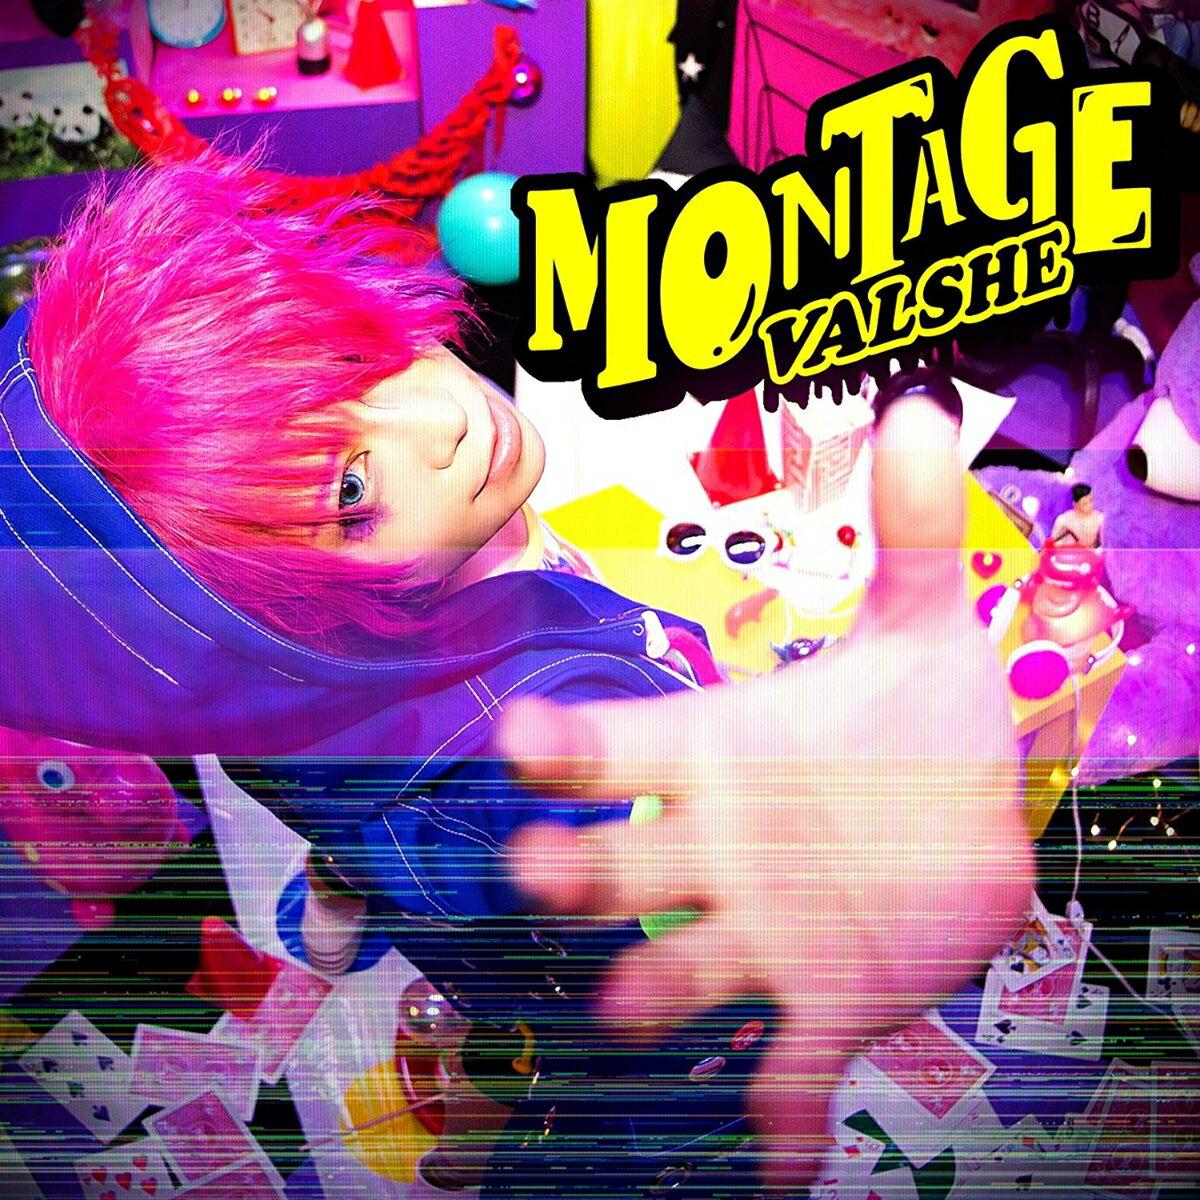 MONTAGE (初回限定盤A CD+DVD) [ VALSHE ]